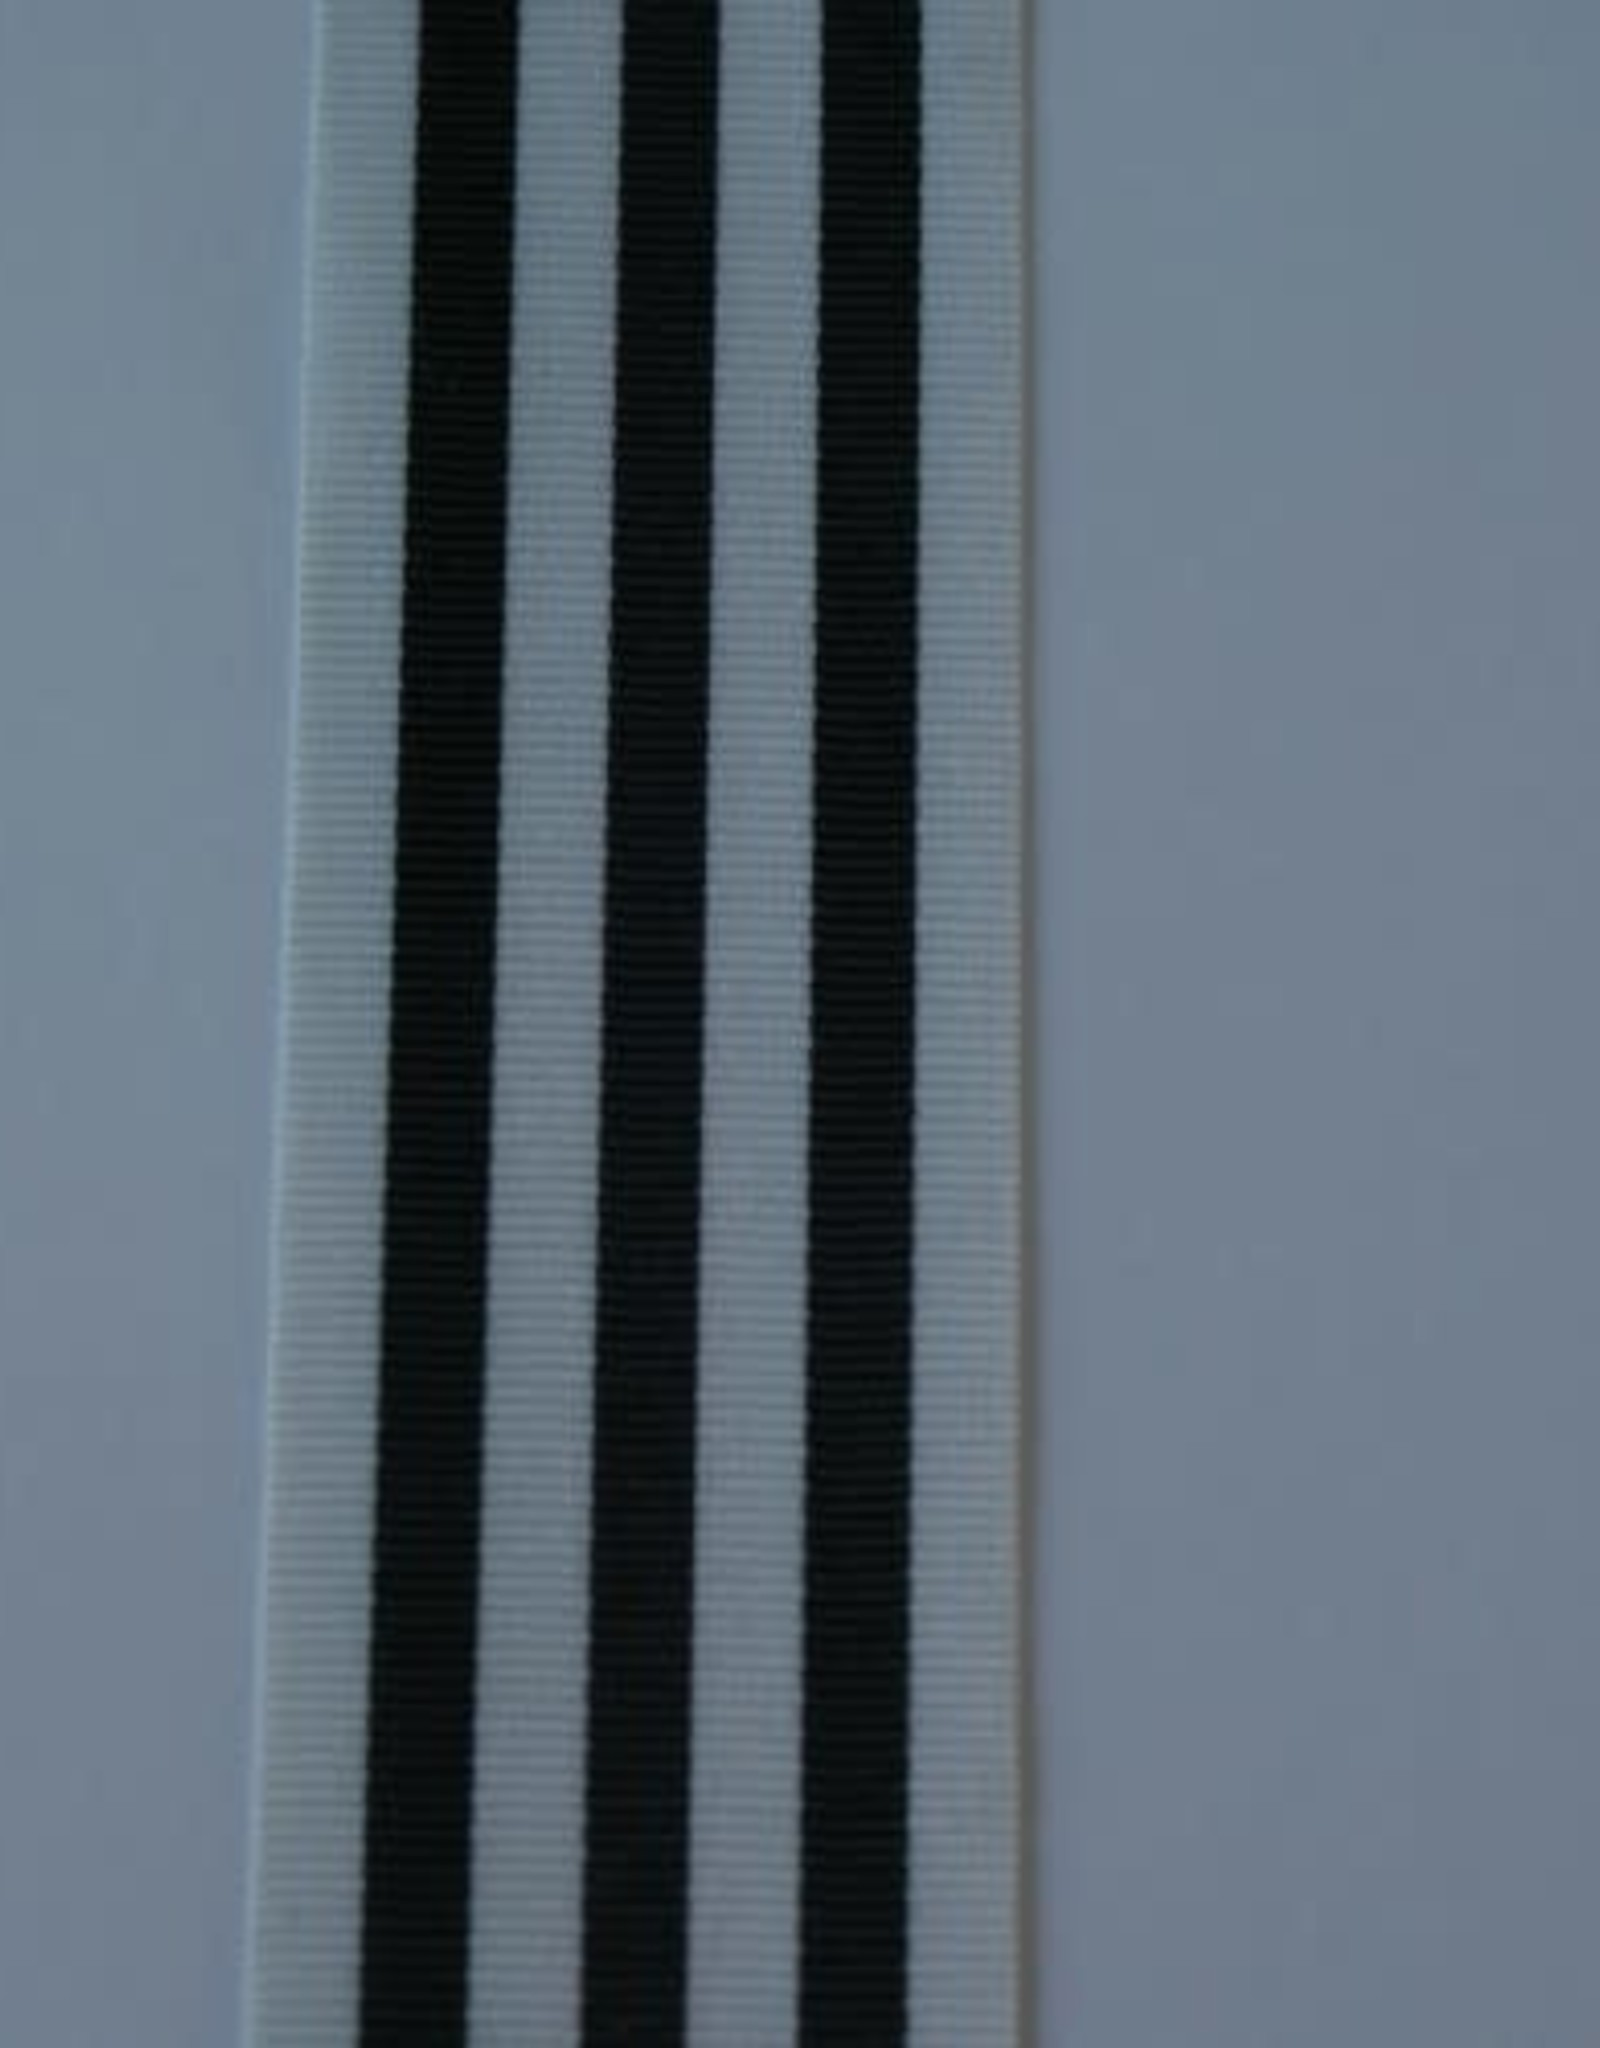 Stik-Stof Ripsband mono color zwart wit 35 mm